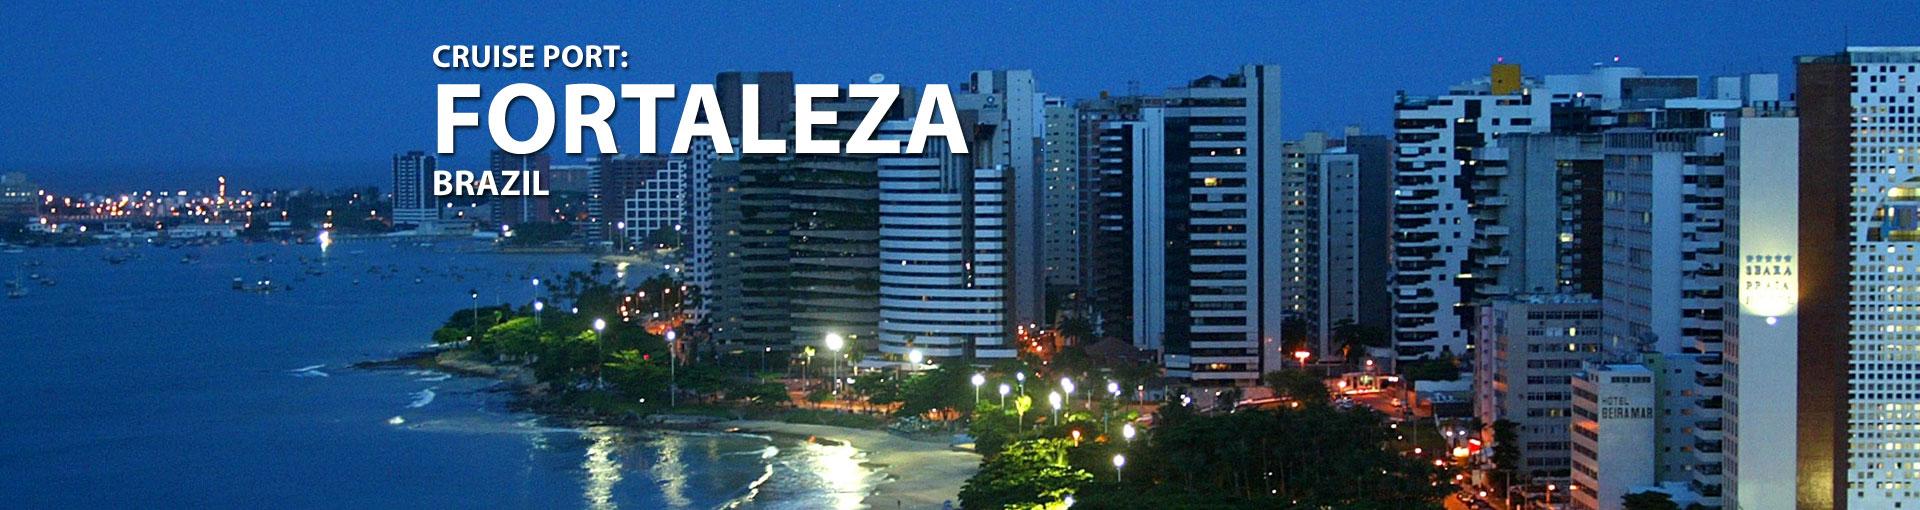 Cruises to Fortaleza, Brazil